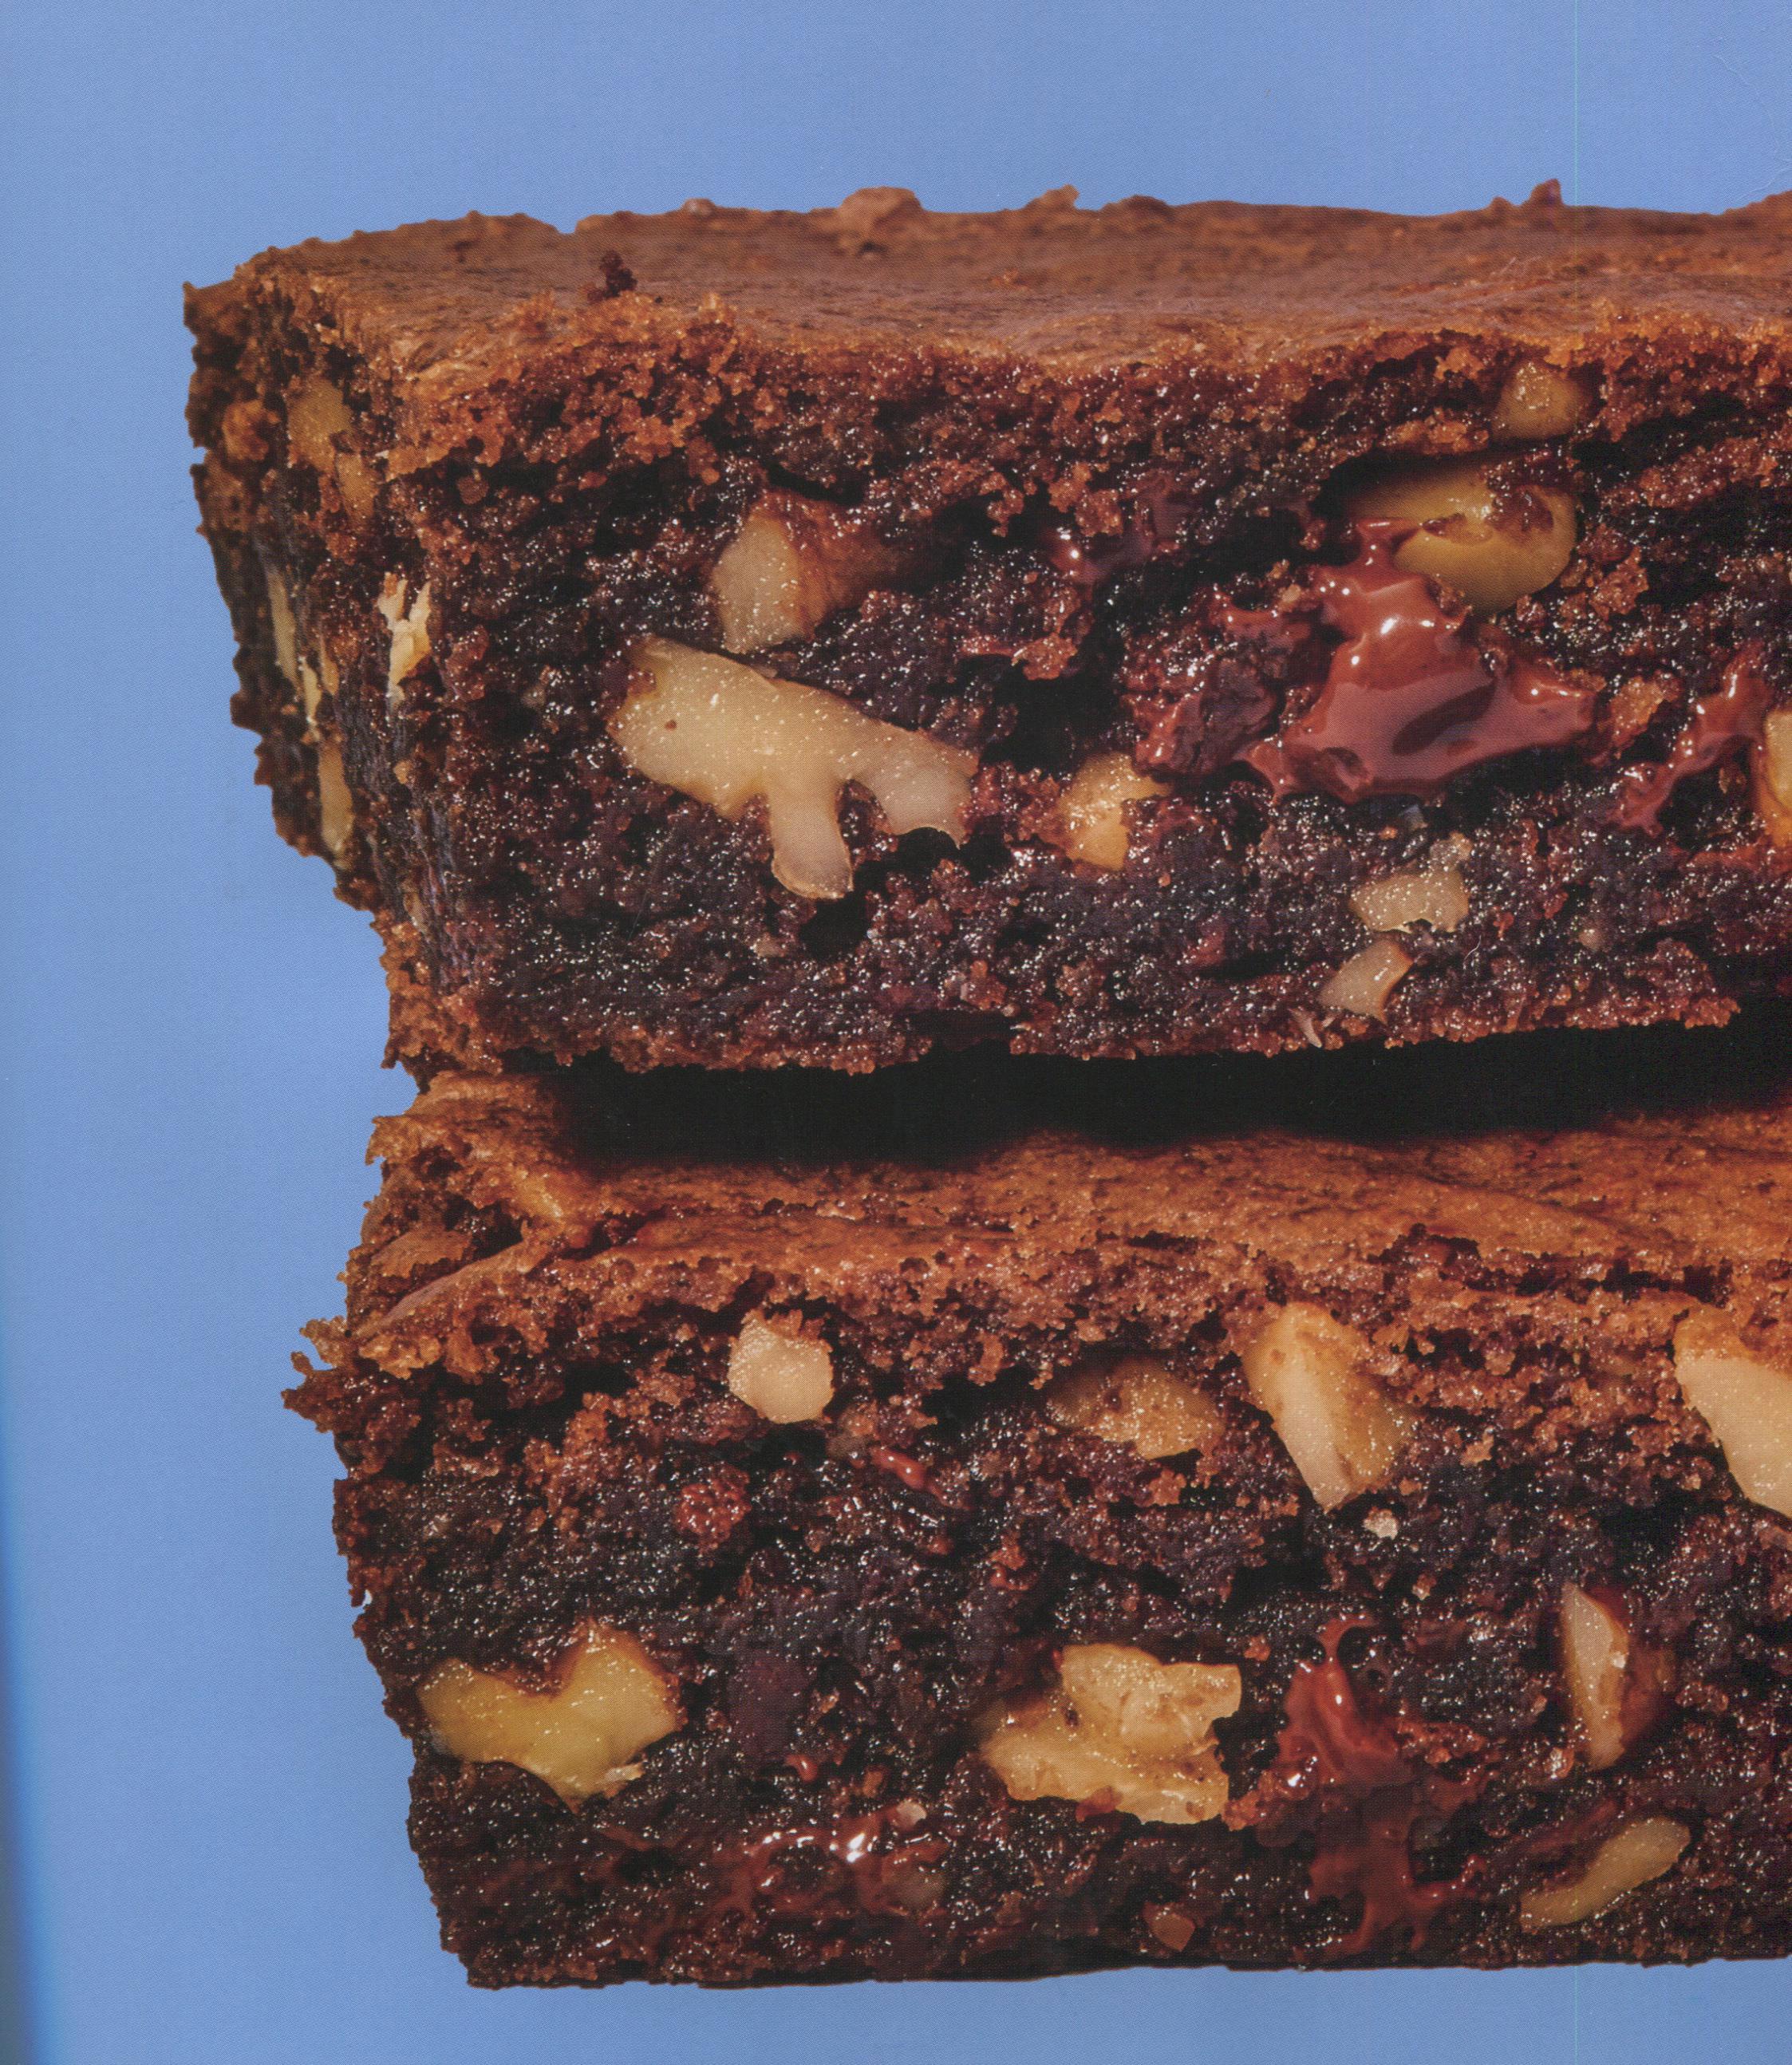 TBT Recipe: Fudgy Mocha Bars from Dorie Greenspan